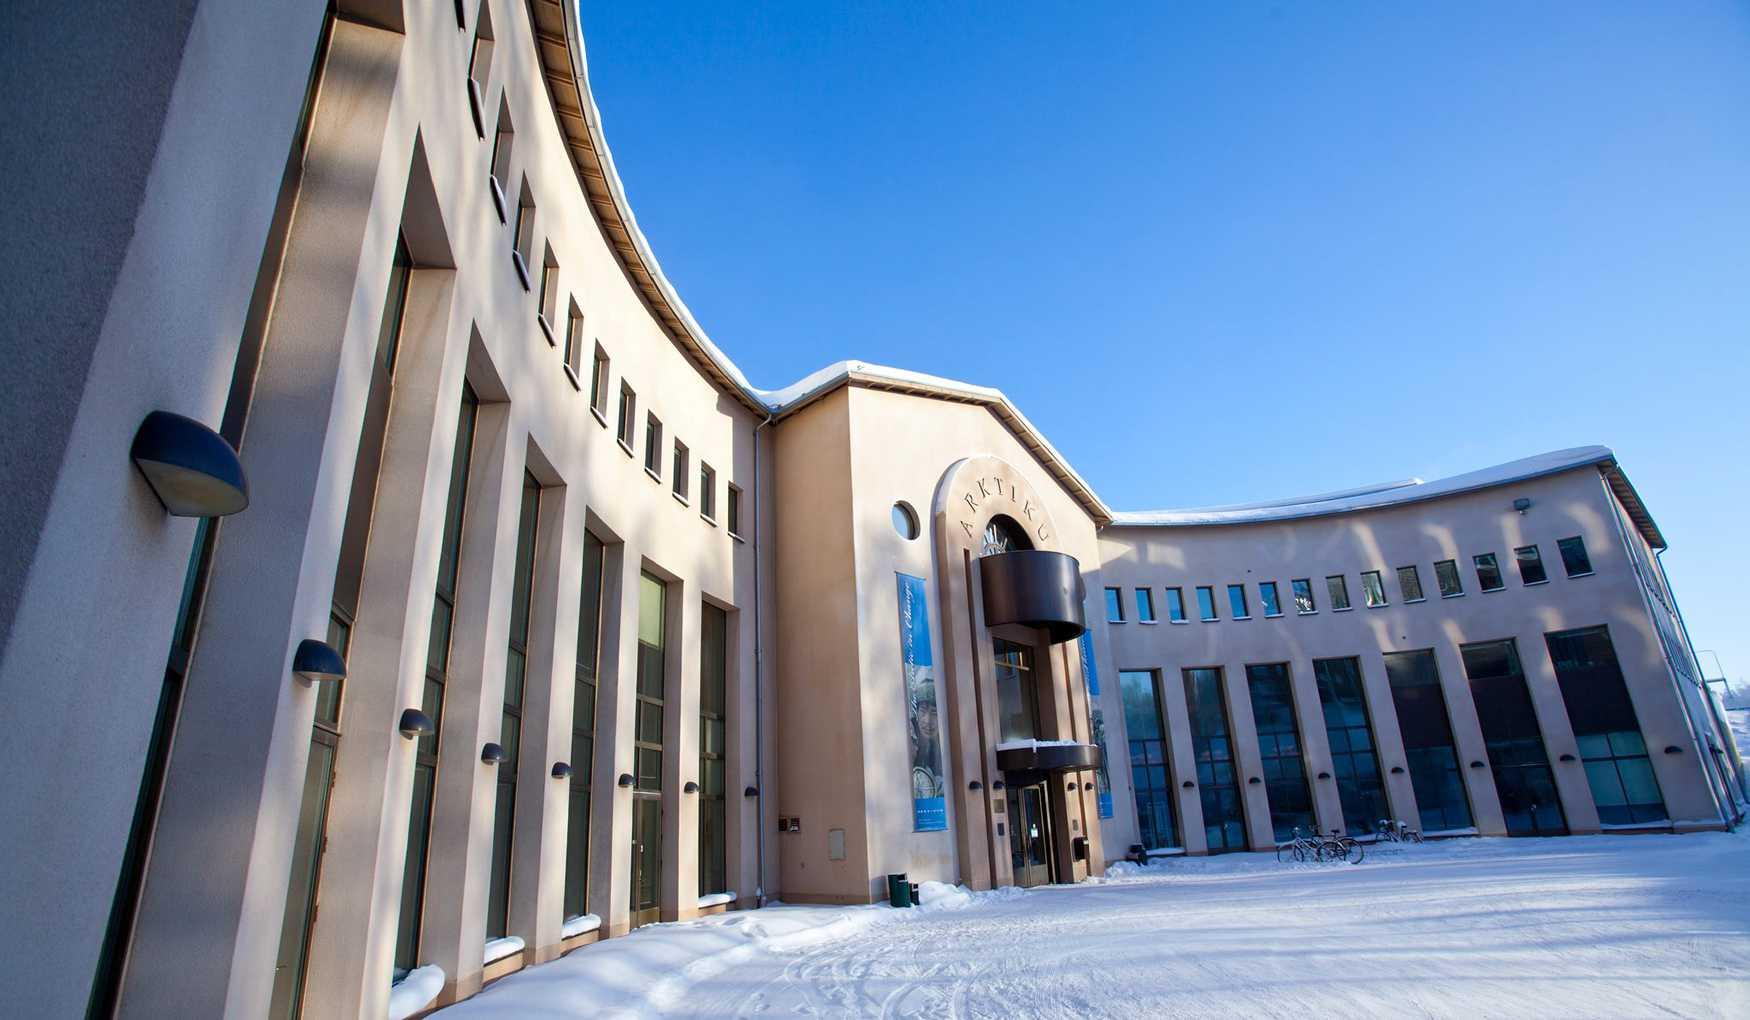 Музей Арктикум